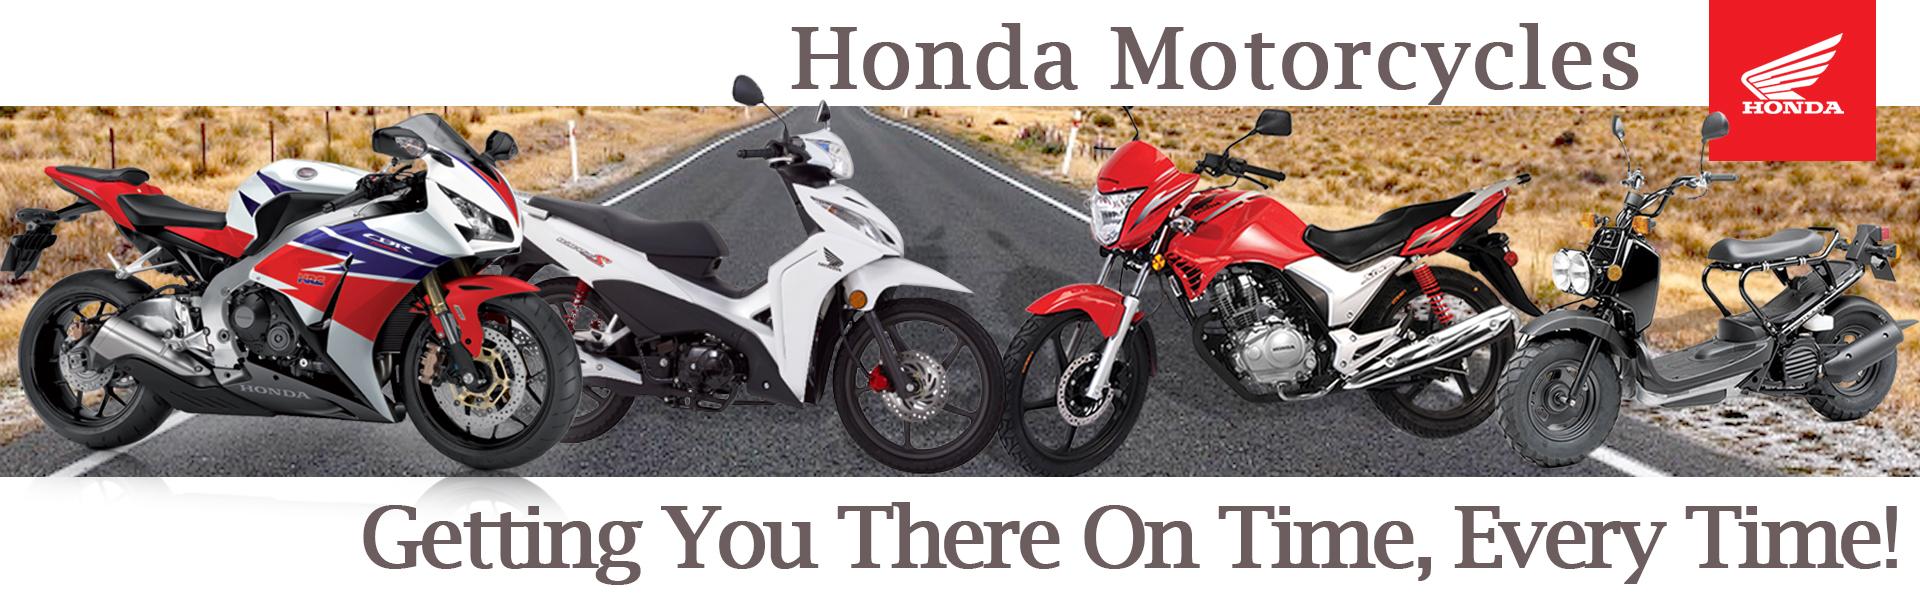 Marics Honda The Home Of In Guyana Motorcycles Designs